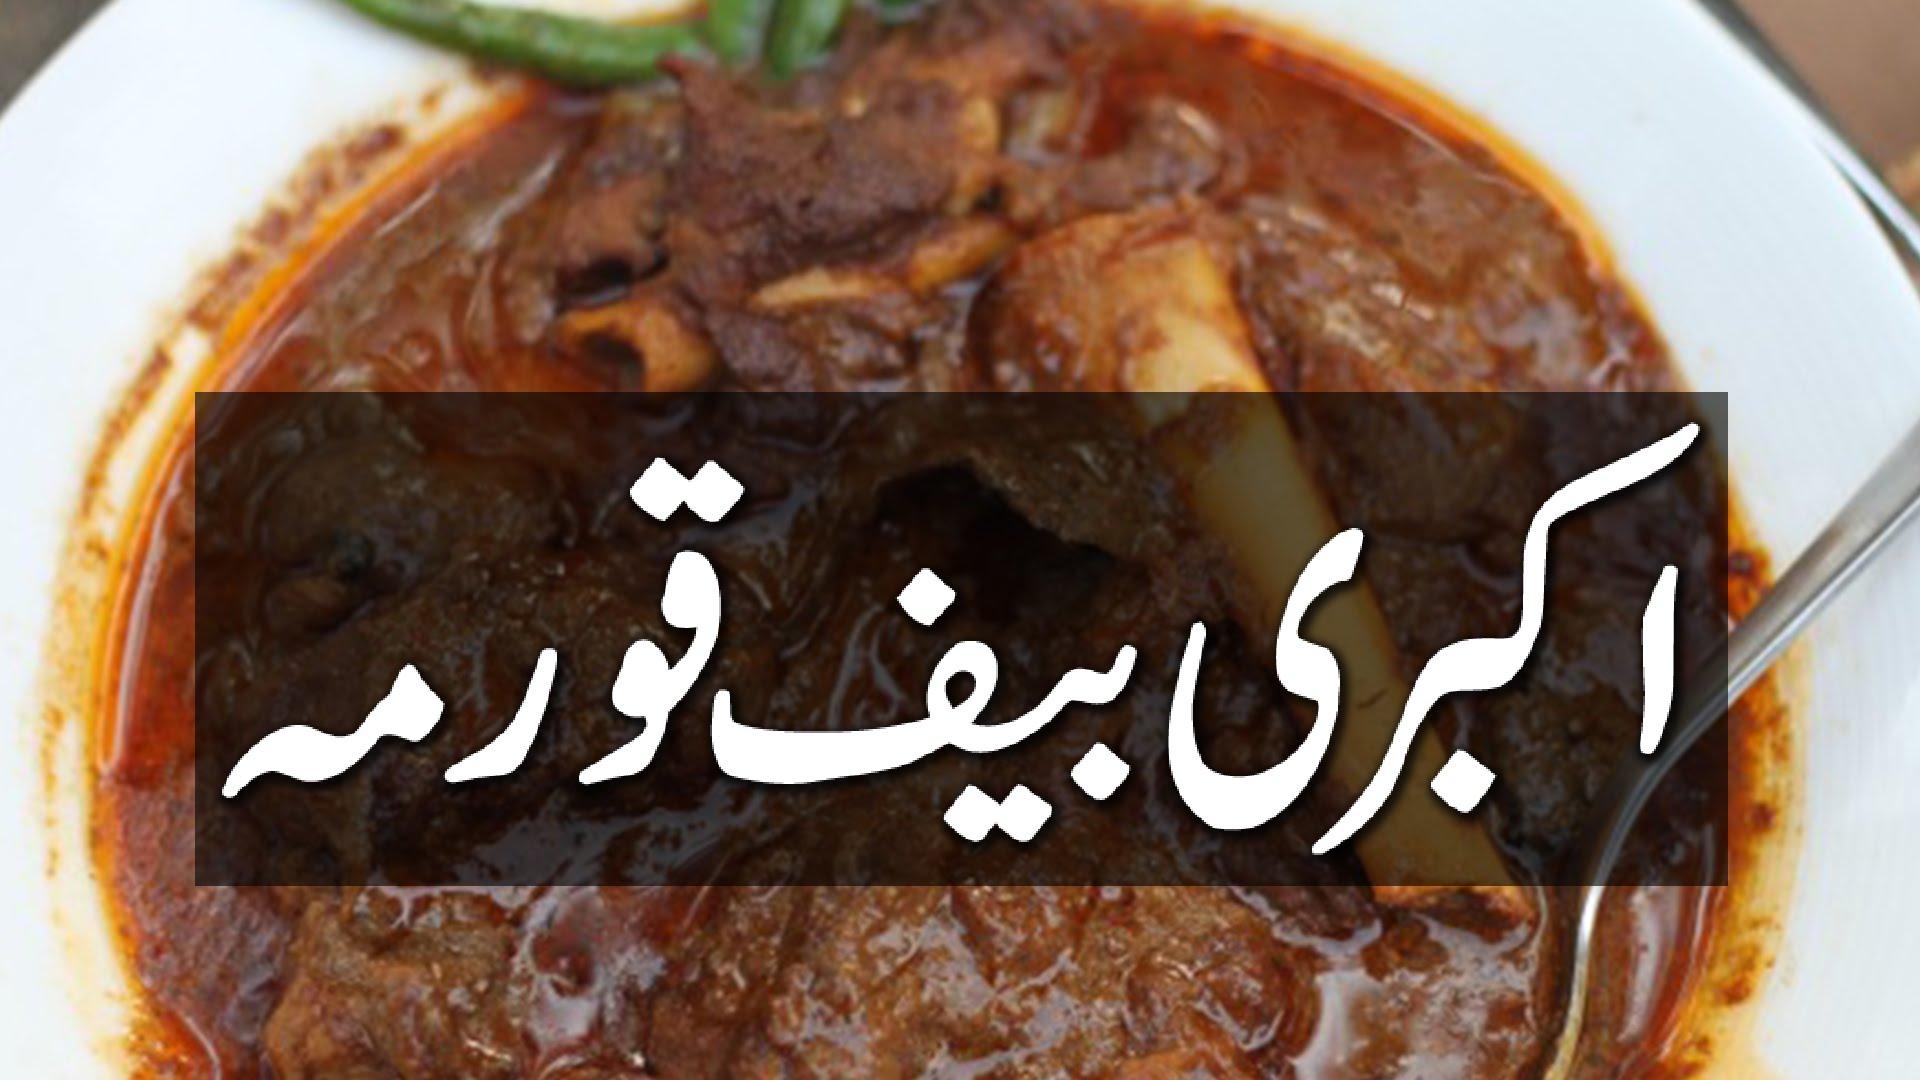 Pakistani Recipes - Beef Korma Recipe - Beef Recipes